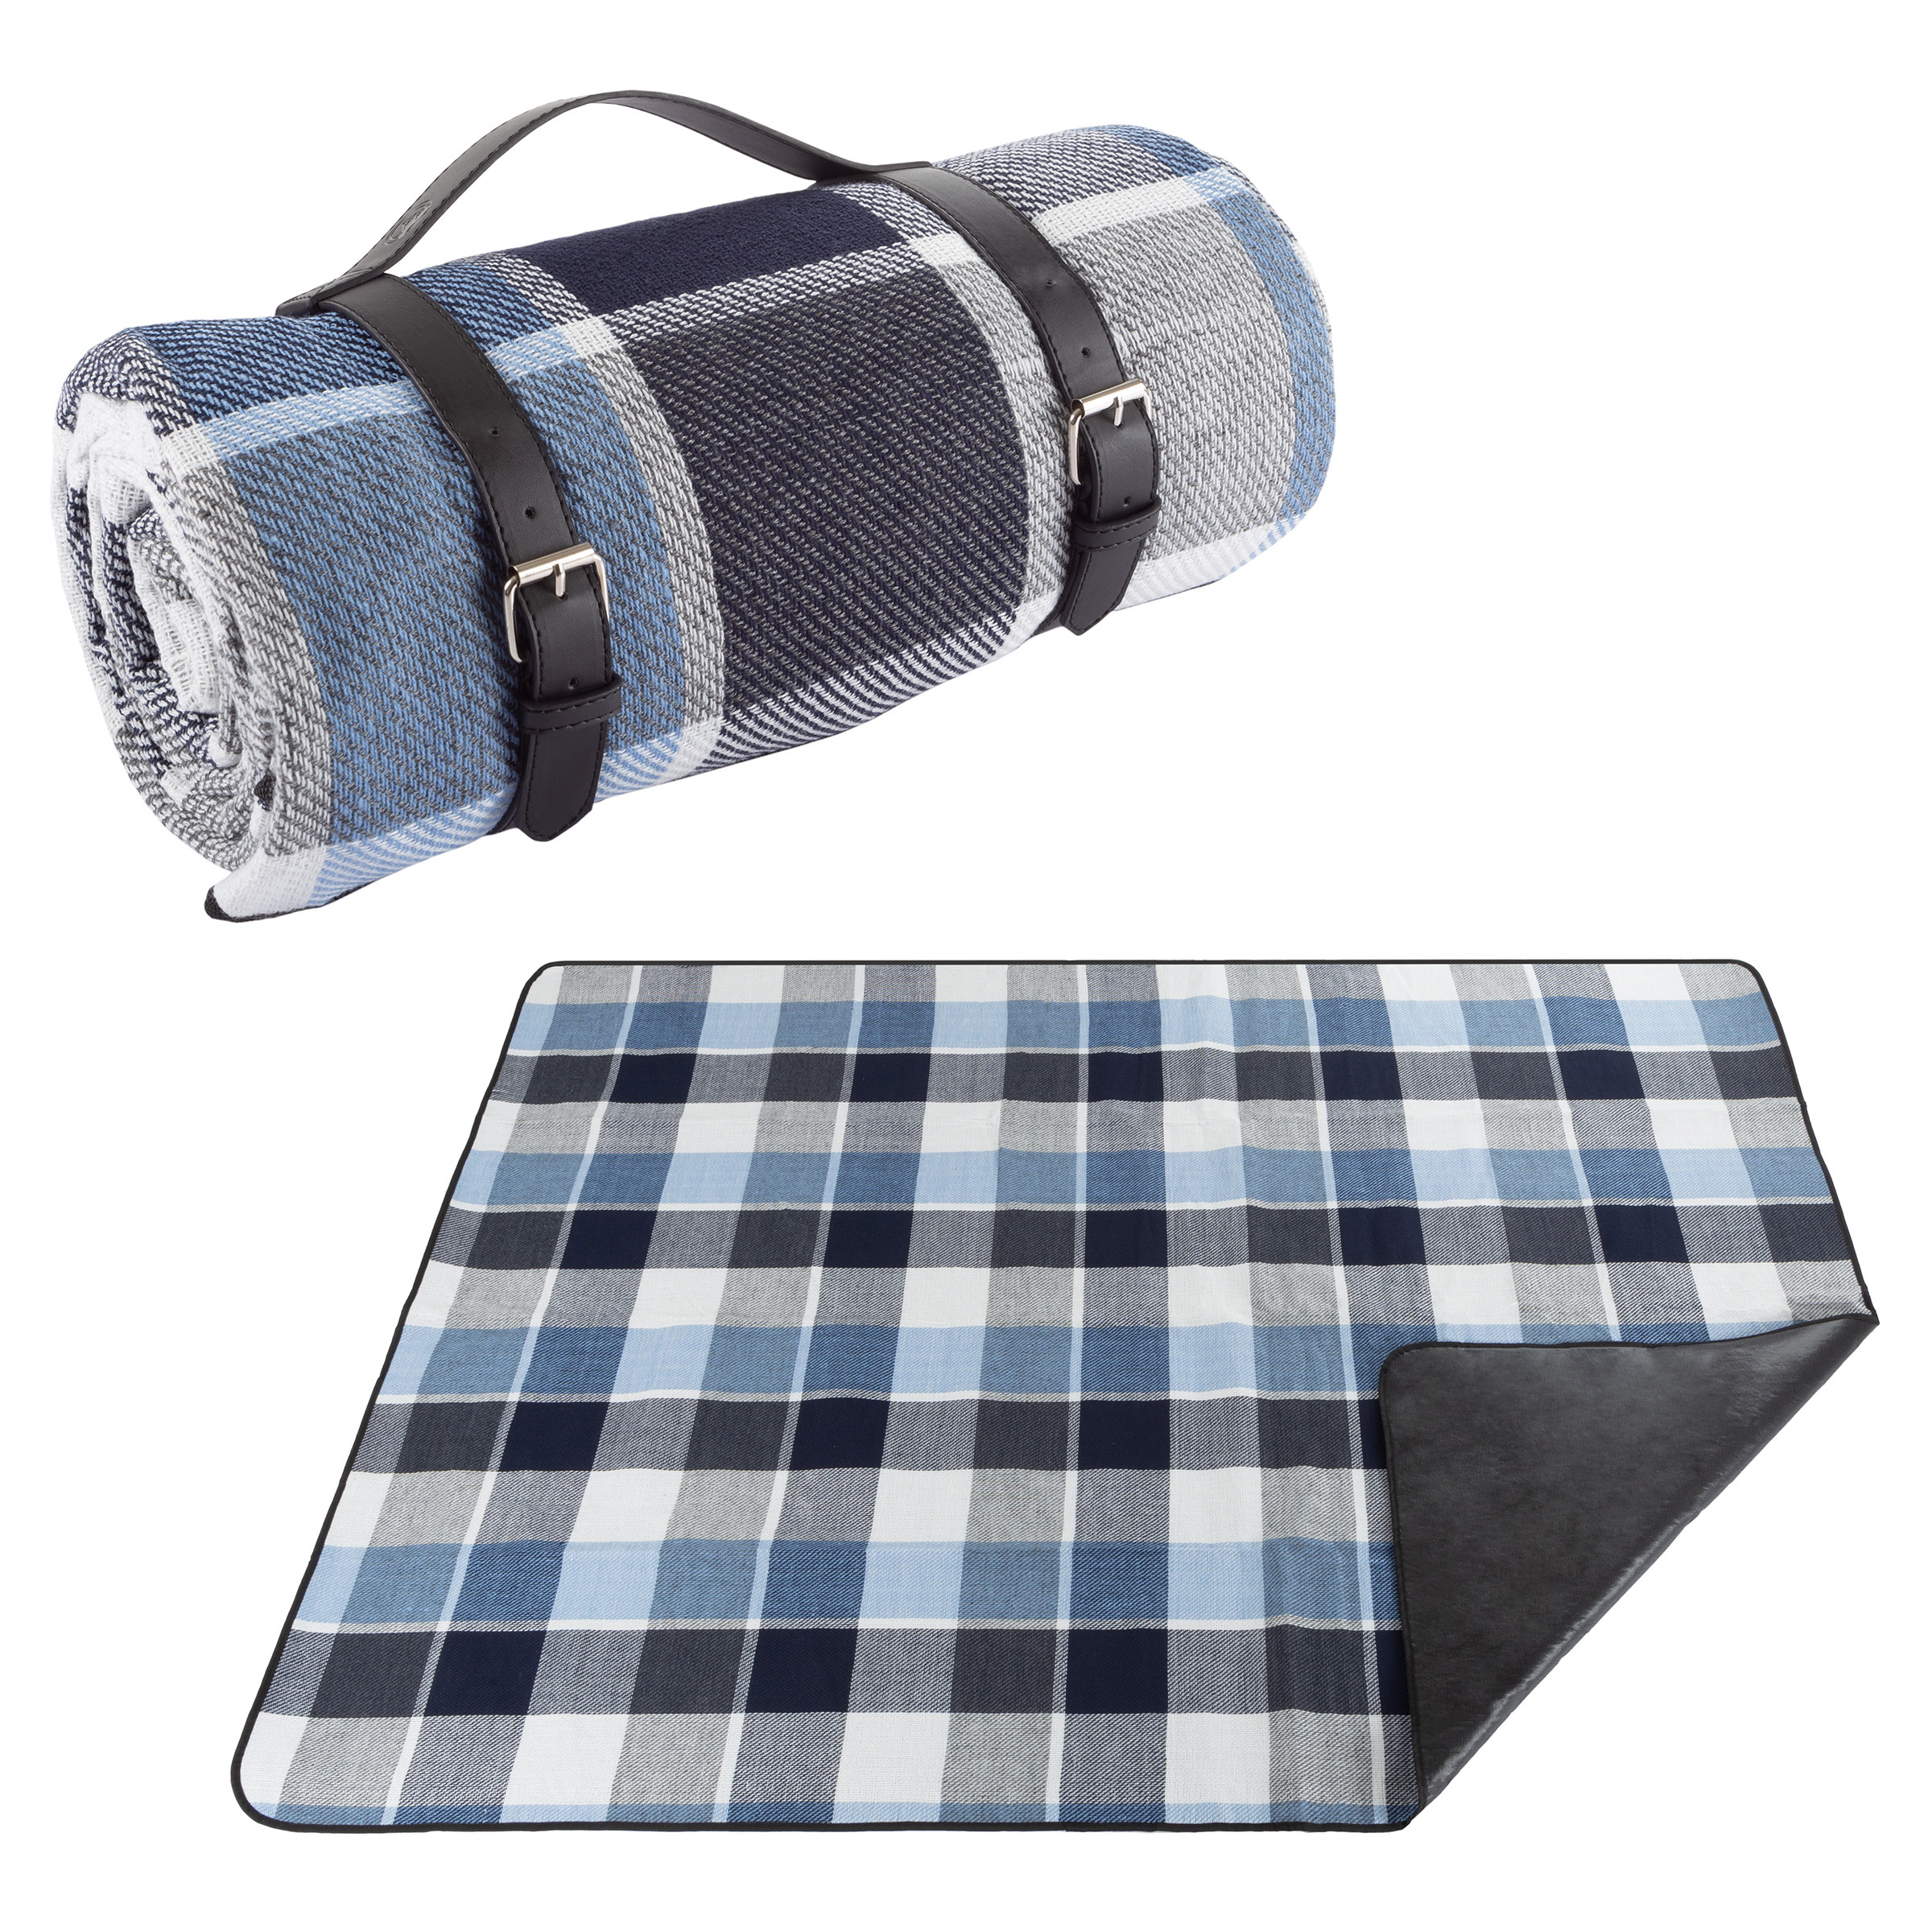 Picnic Blanket Mat 100cm  Waterproof Fleece Camping Outdoor Beach Festival Rug